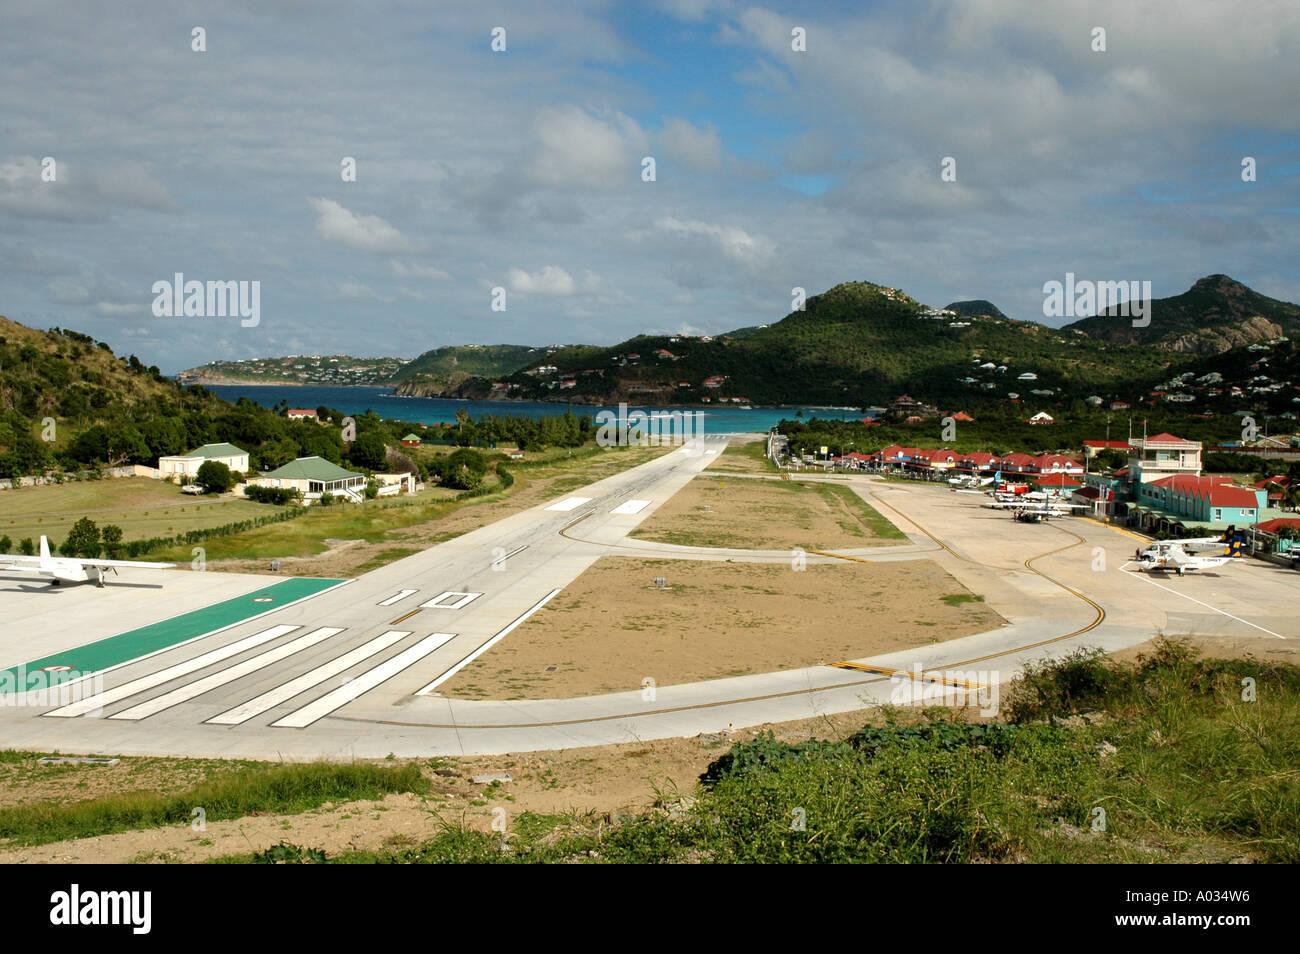 St Bareths short airport runway - Stock Image